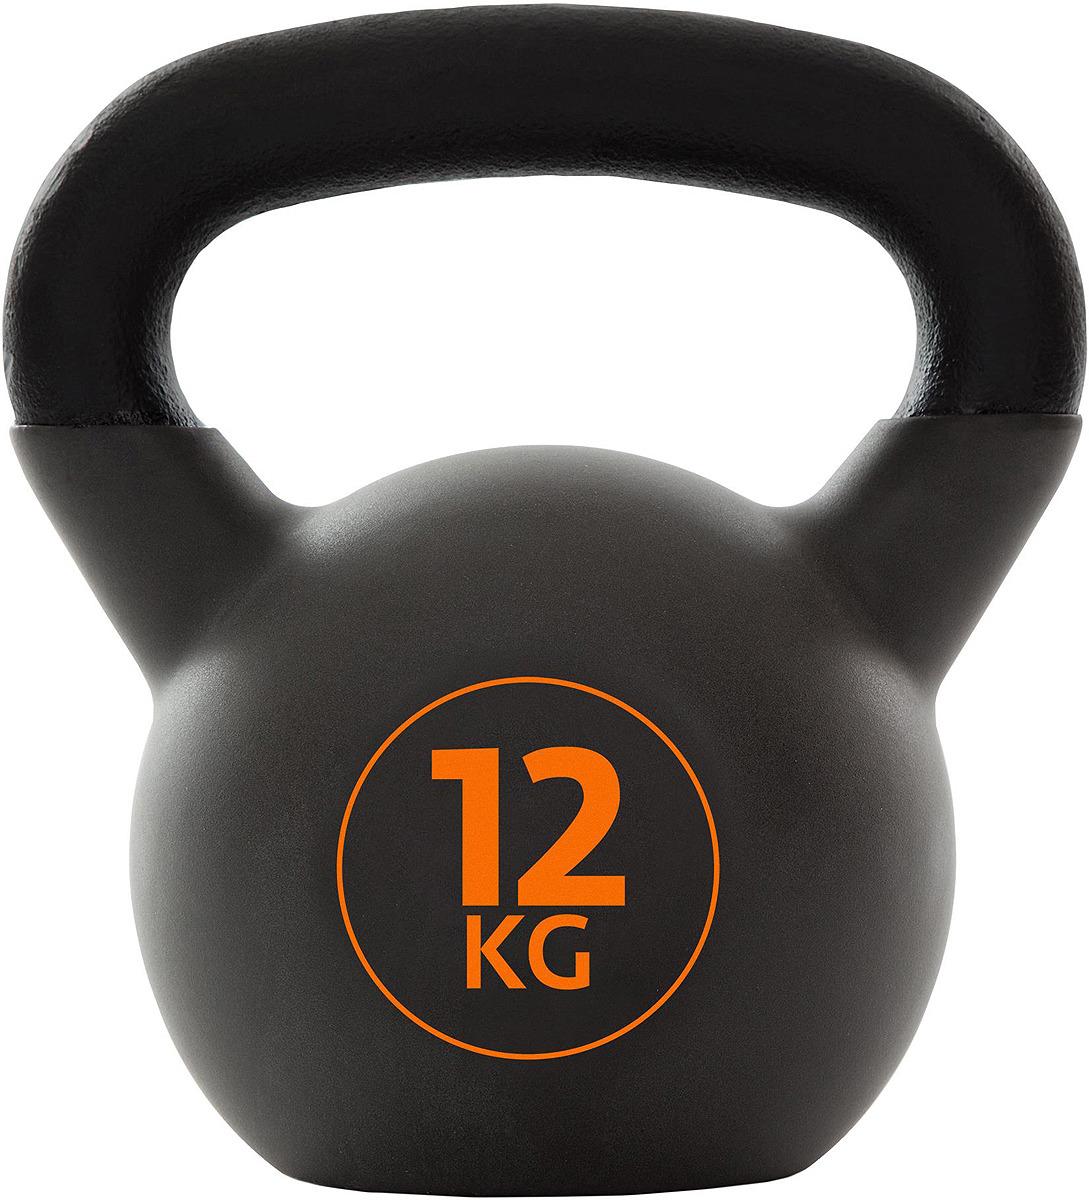 Гиря Torneo Kettlebell, 12 кг гиря iron head медведь 32 0 кг